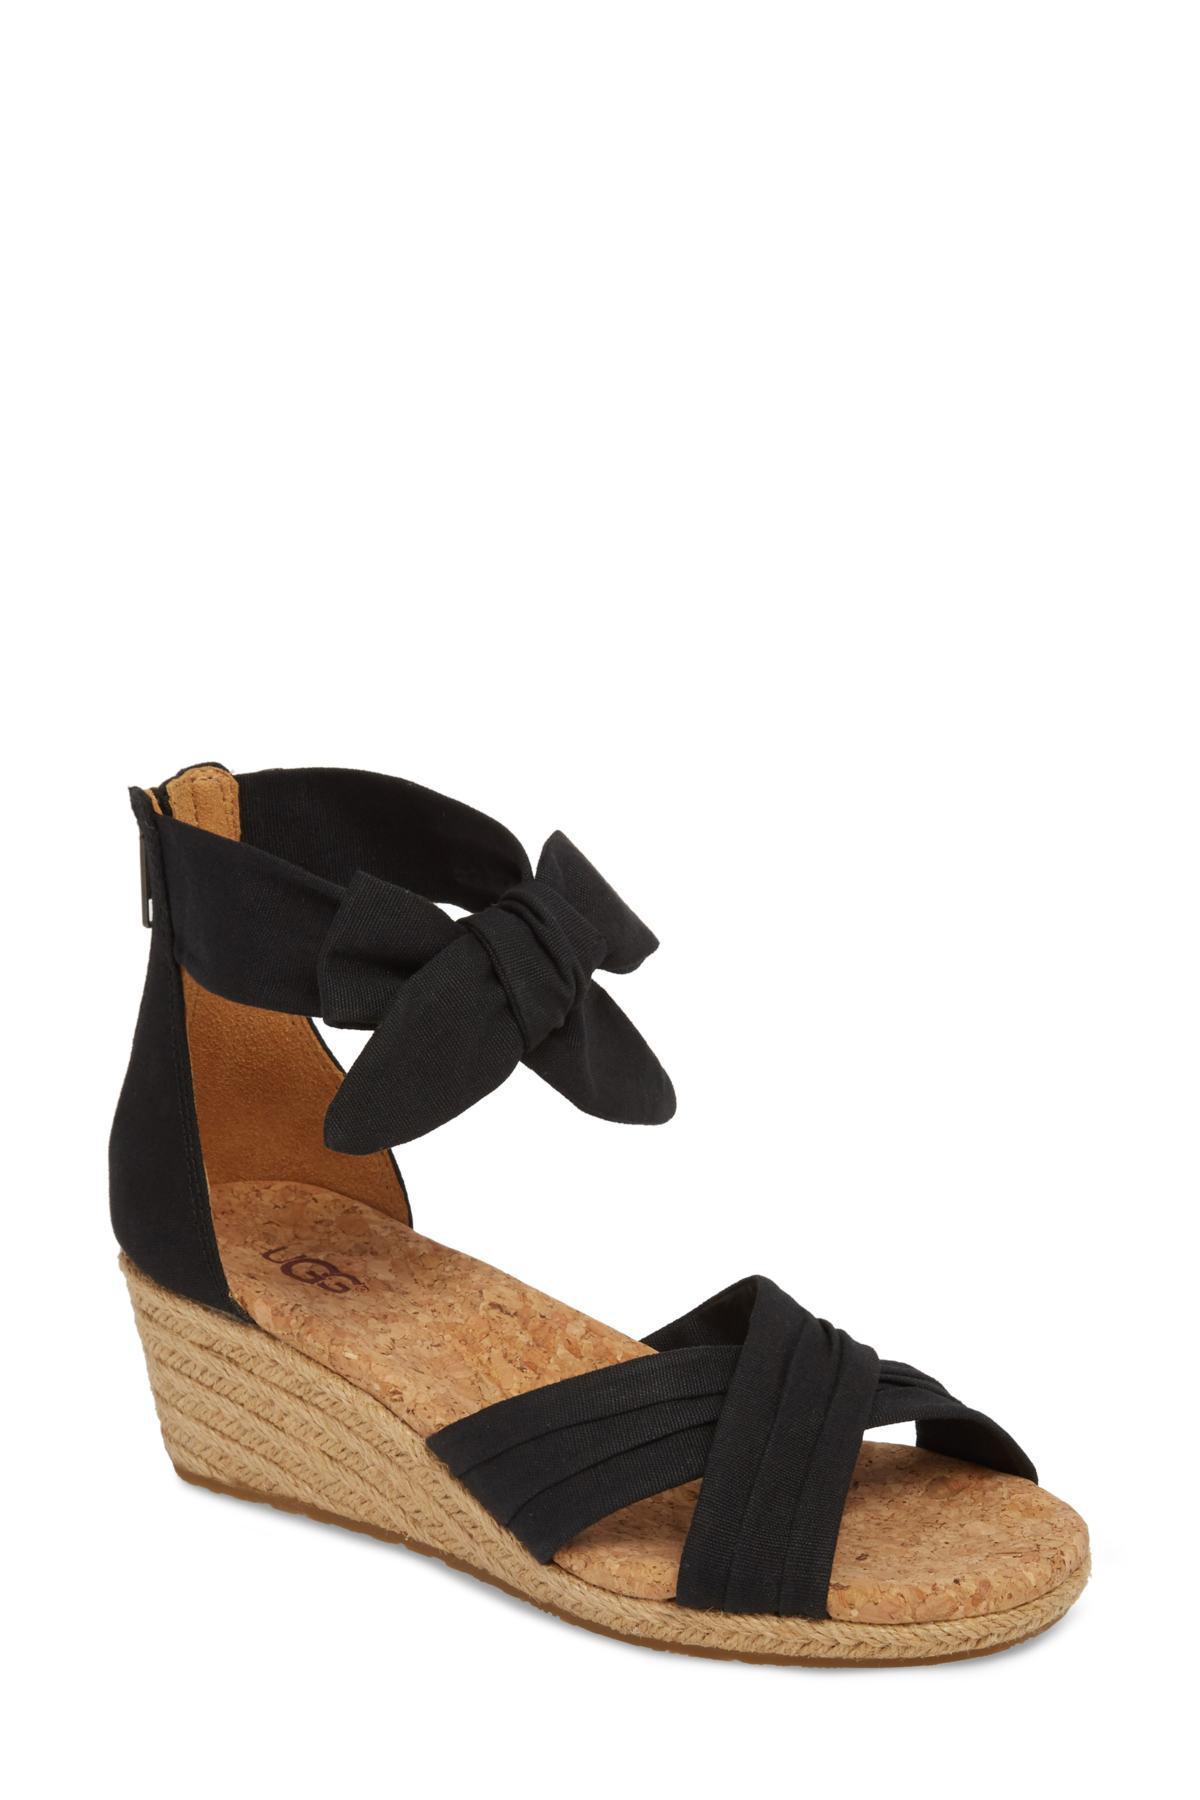 e79bfe5a2f8 Ugg Black (r) Traci Espadrille Wedge Sandal (women)